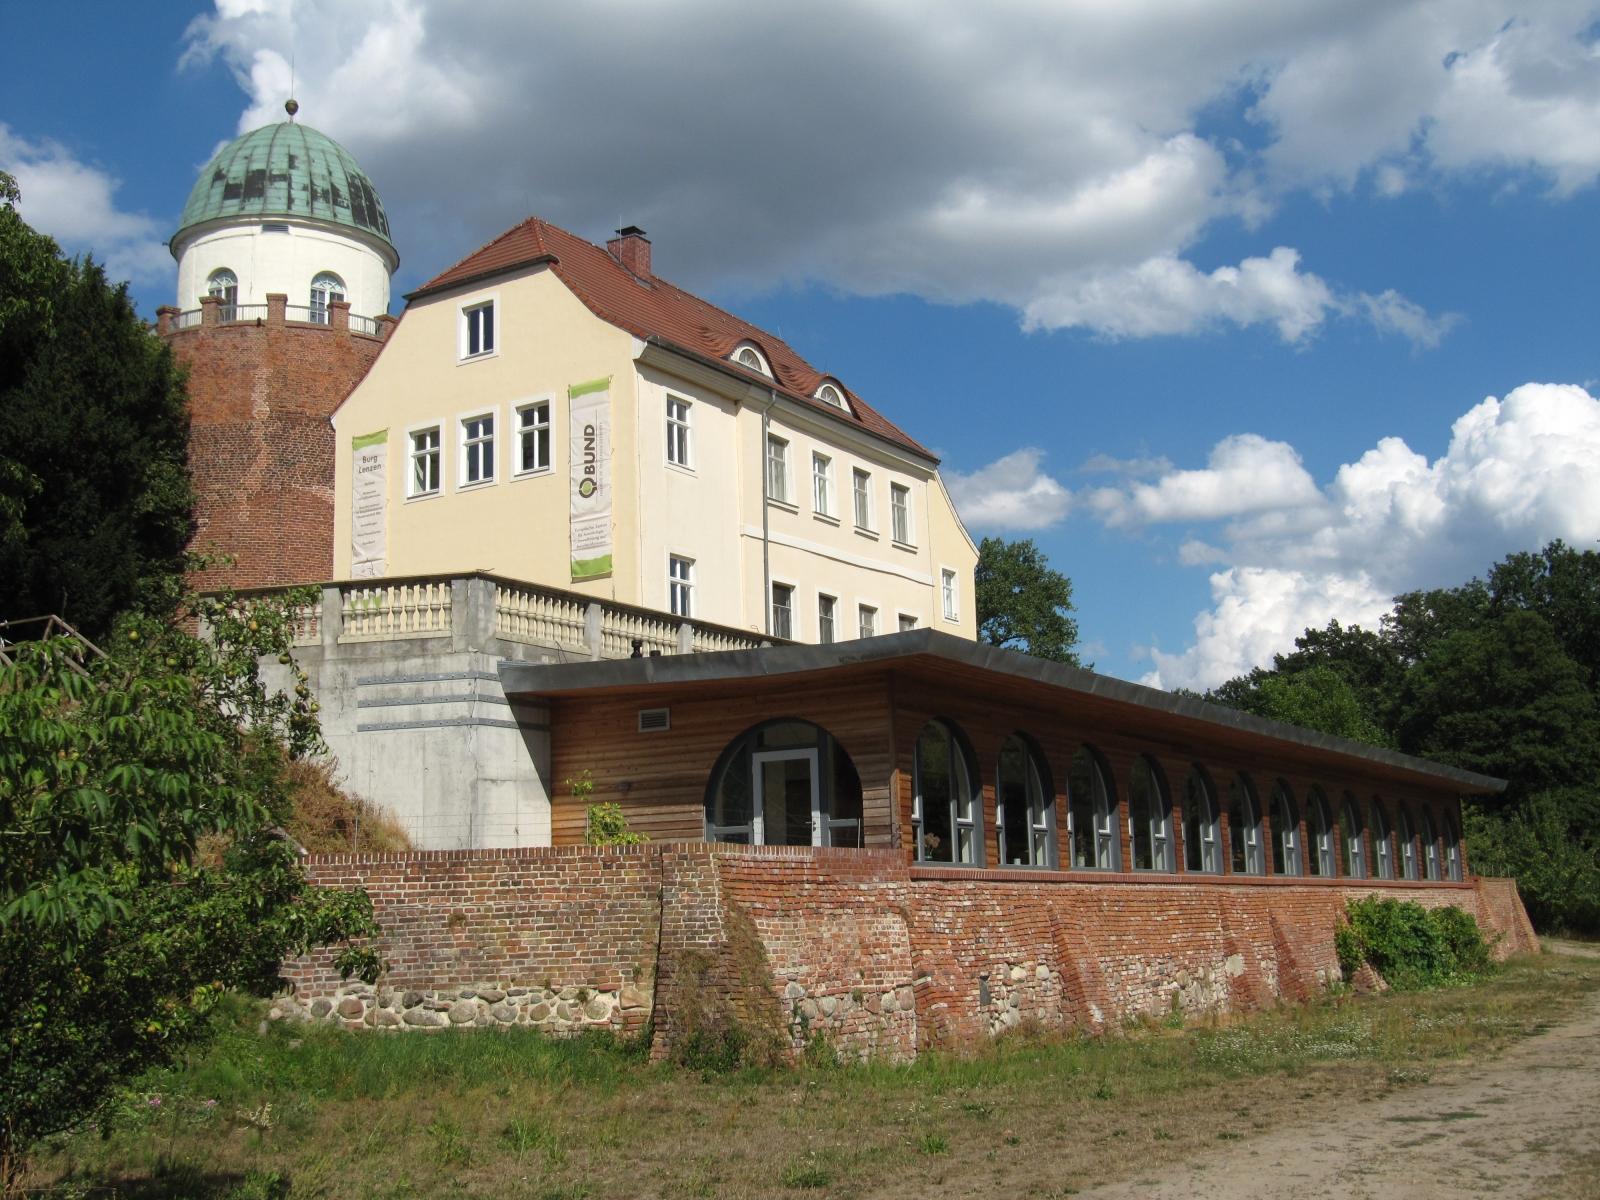 Burg-Lenzen